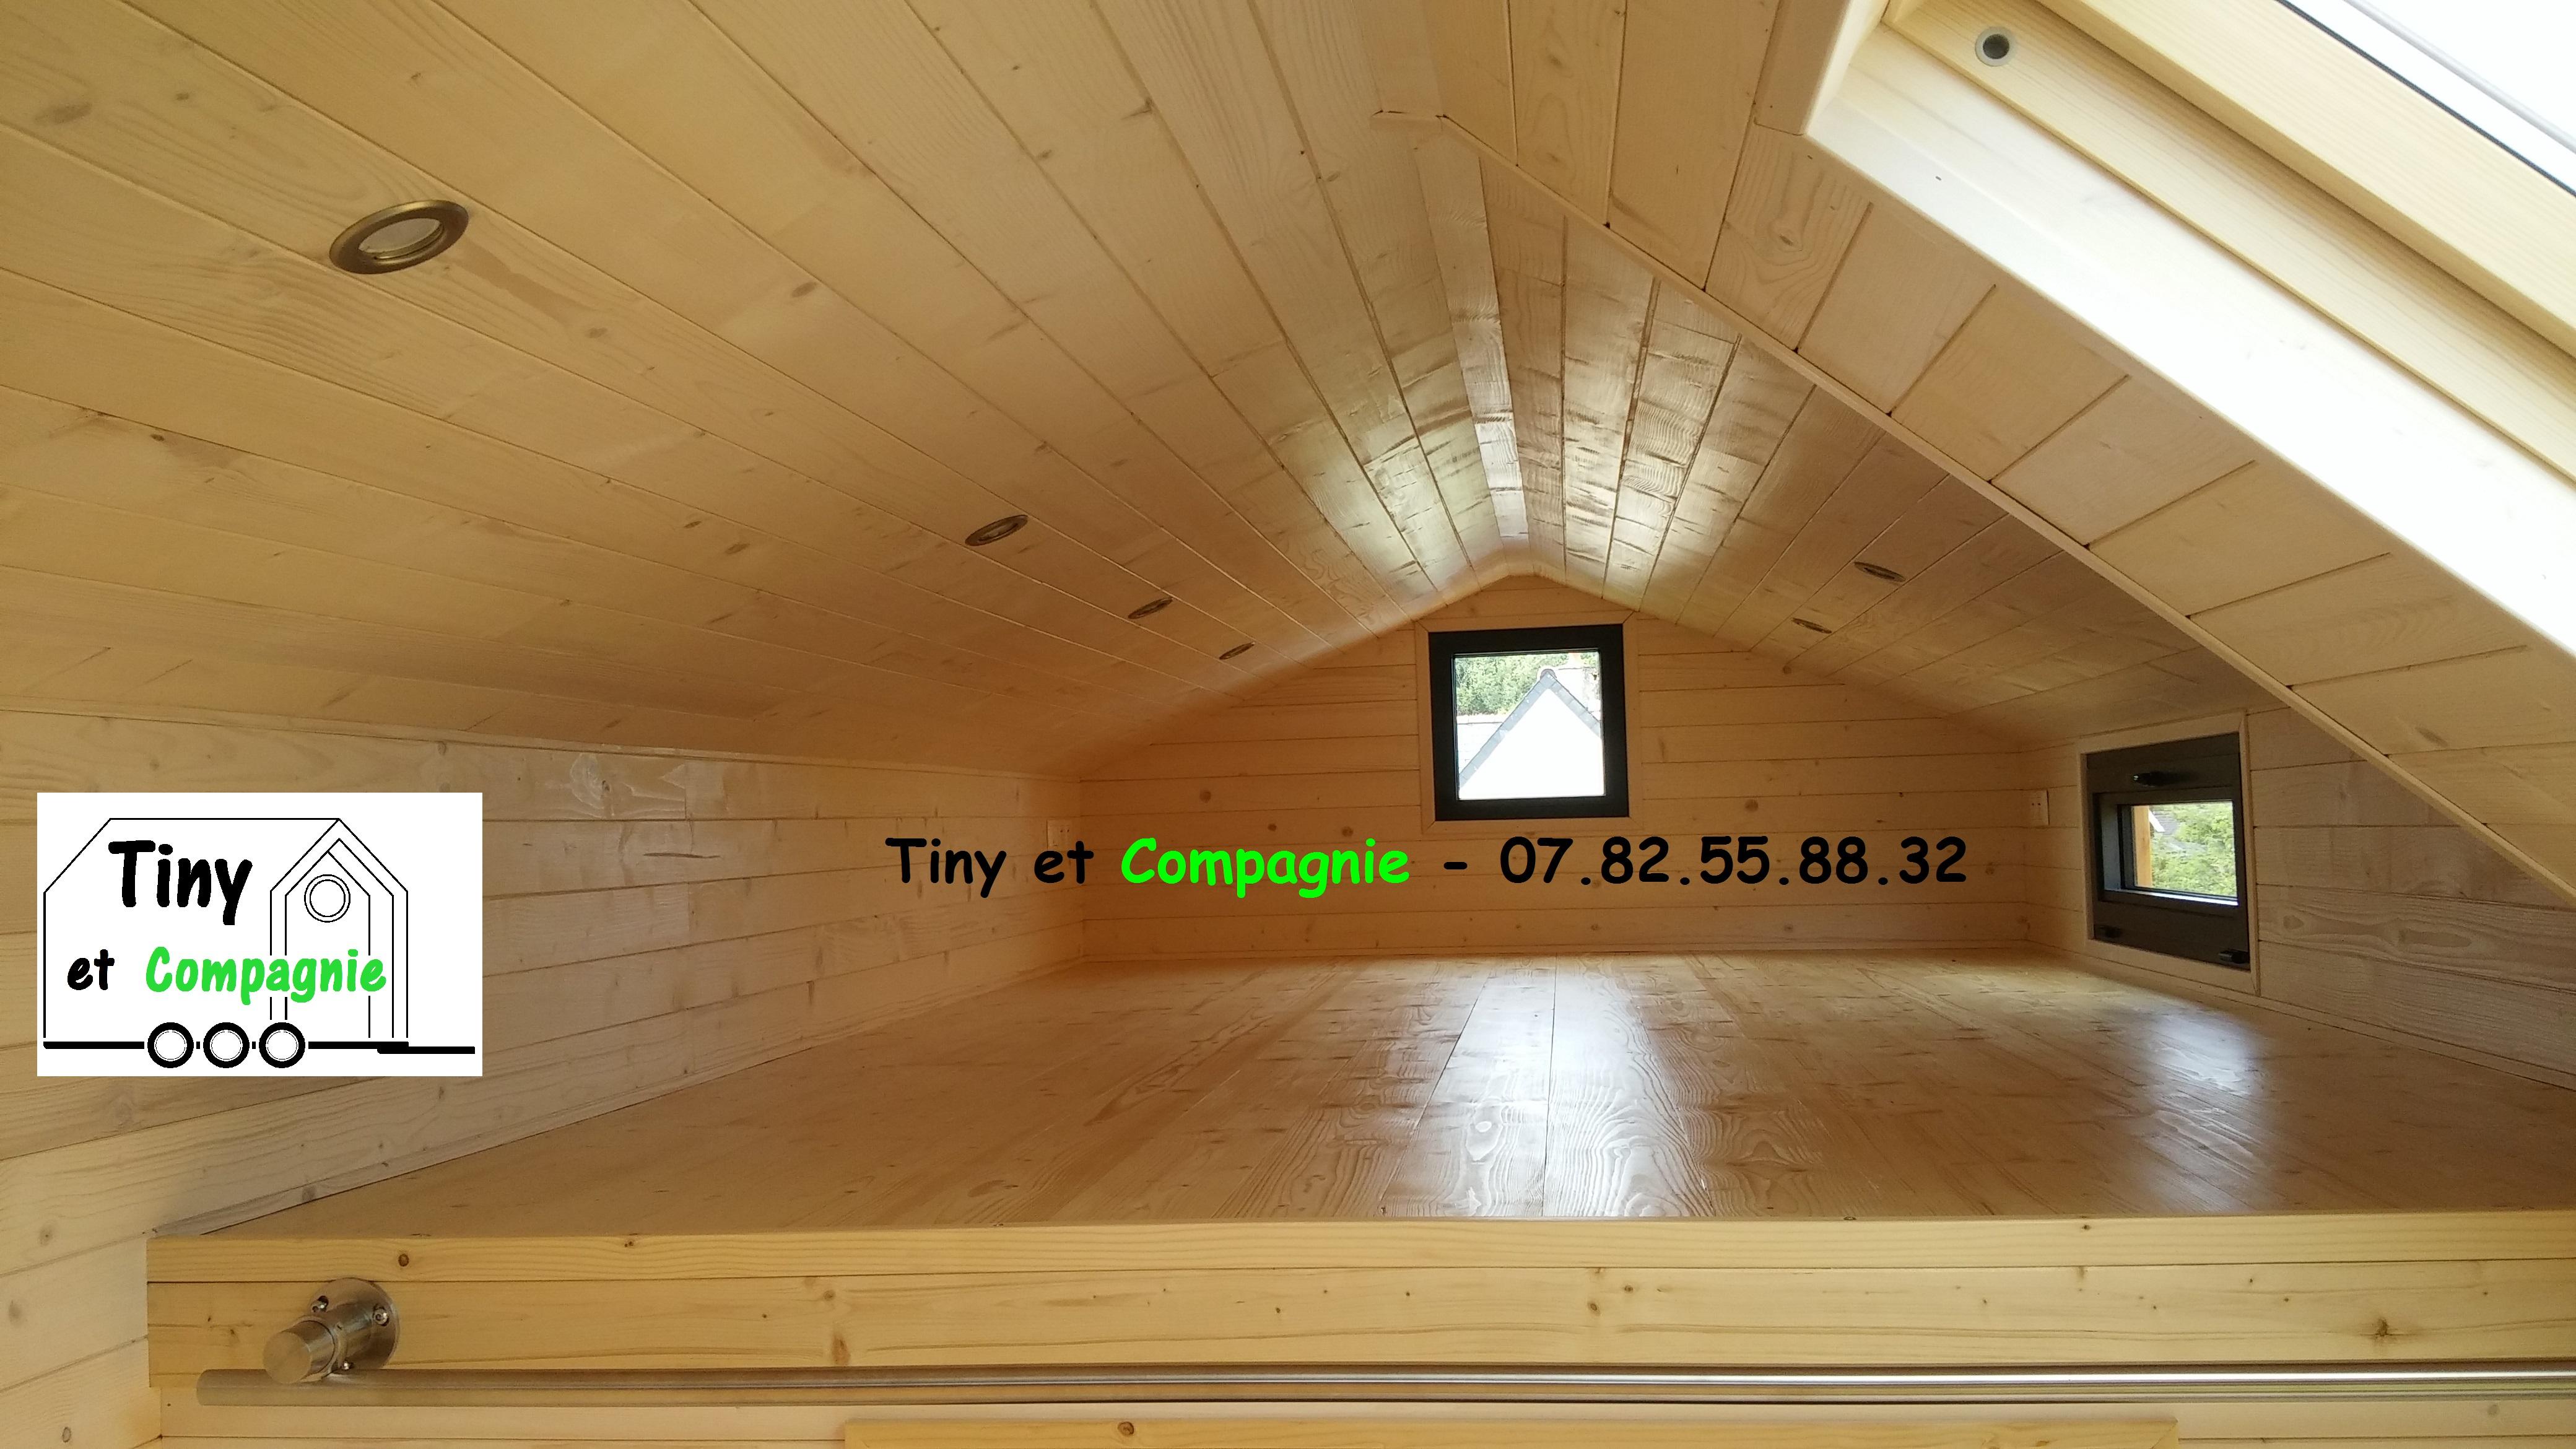 Tiny et Compagnie - Cabana 2019 (Mezzani